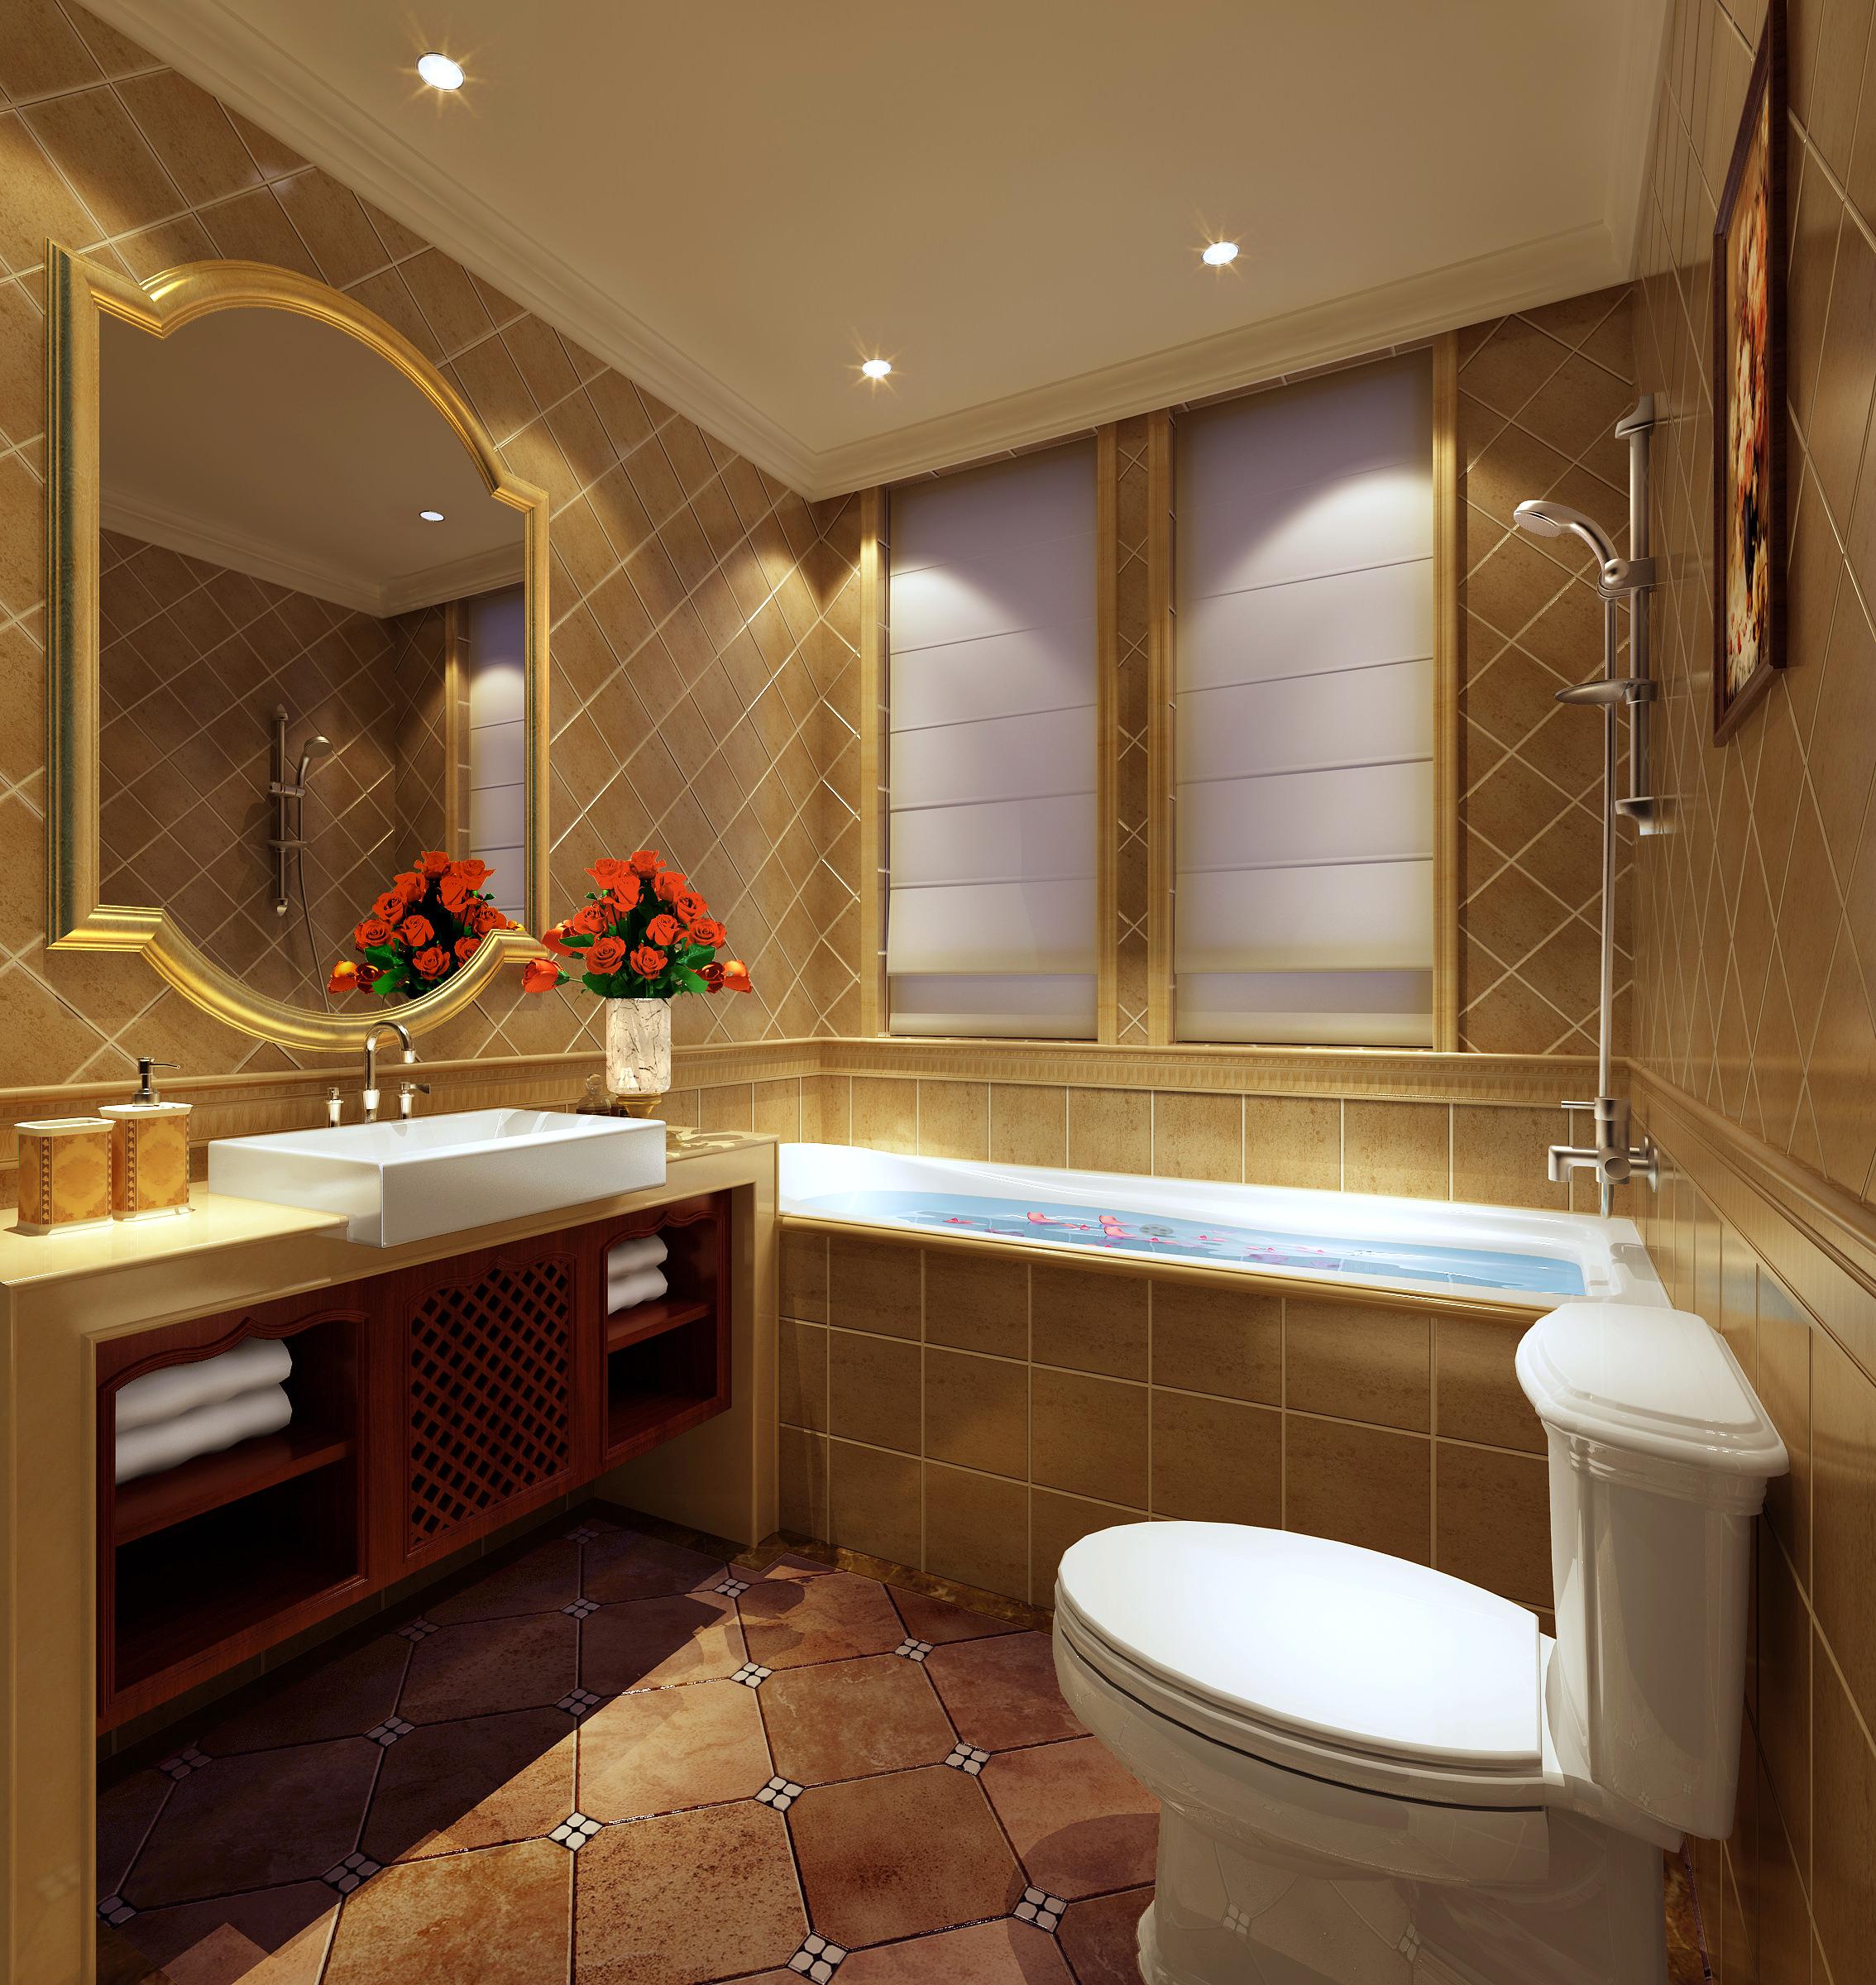 Luxury bathroom 3D Model .max - CGTrader.com on Bathroom Models  id=21617